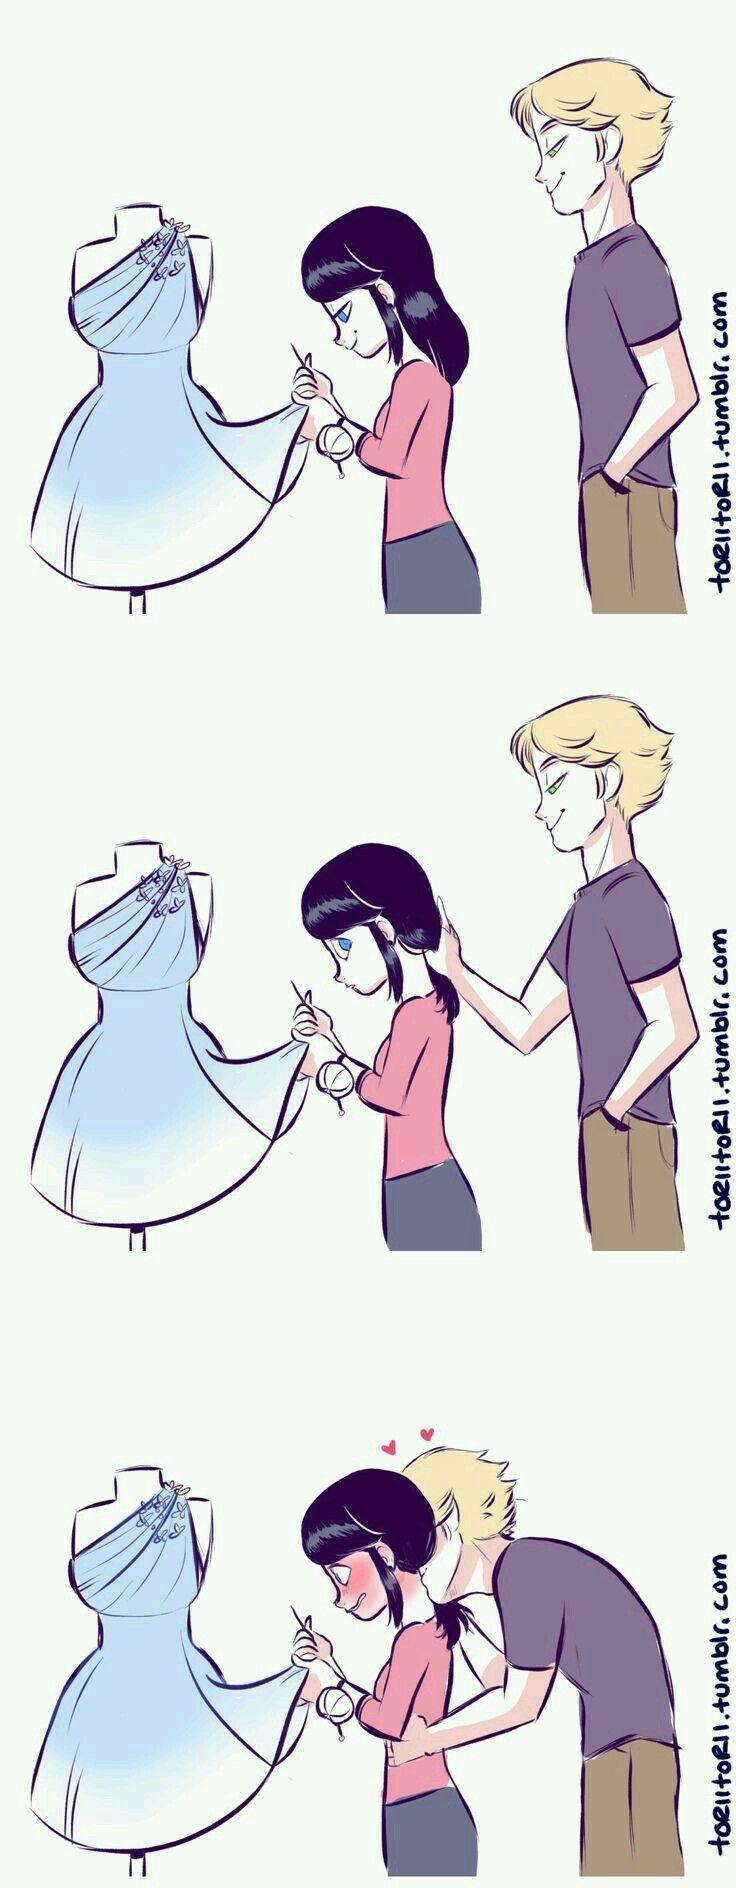 Pervertido -_-* pero guapo ♡_♡